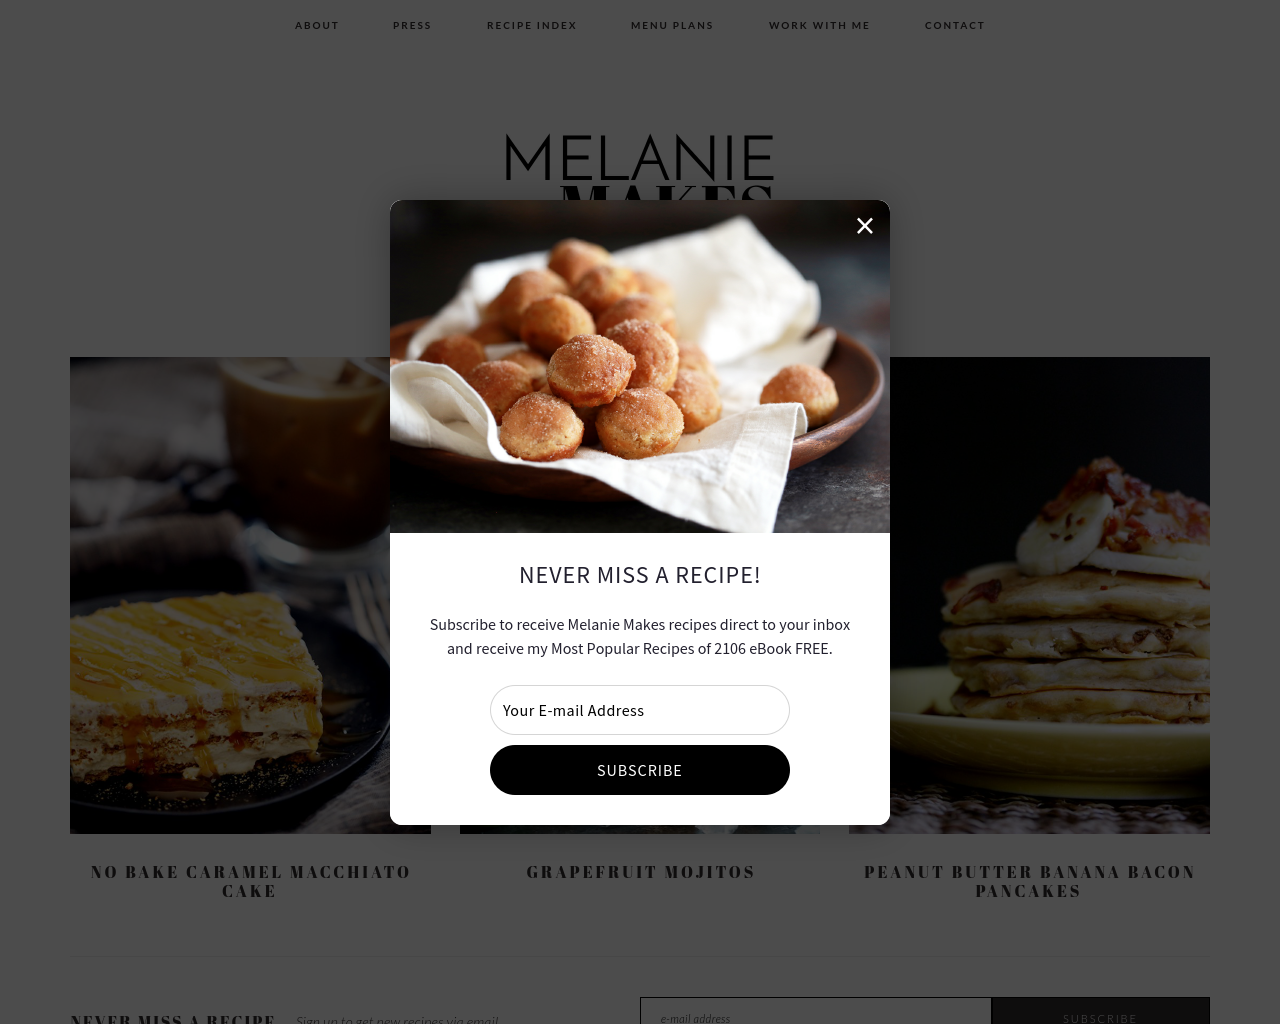 Melanie-Makes-Advertising-Reviews-Pricing